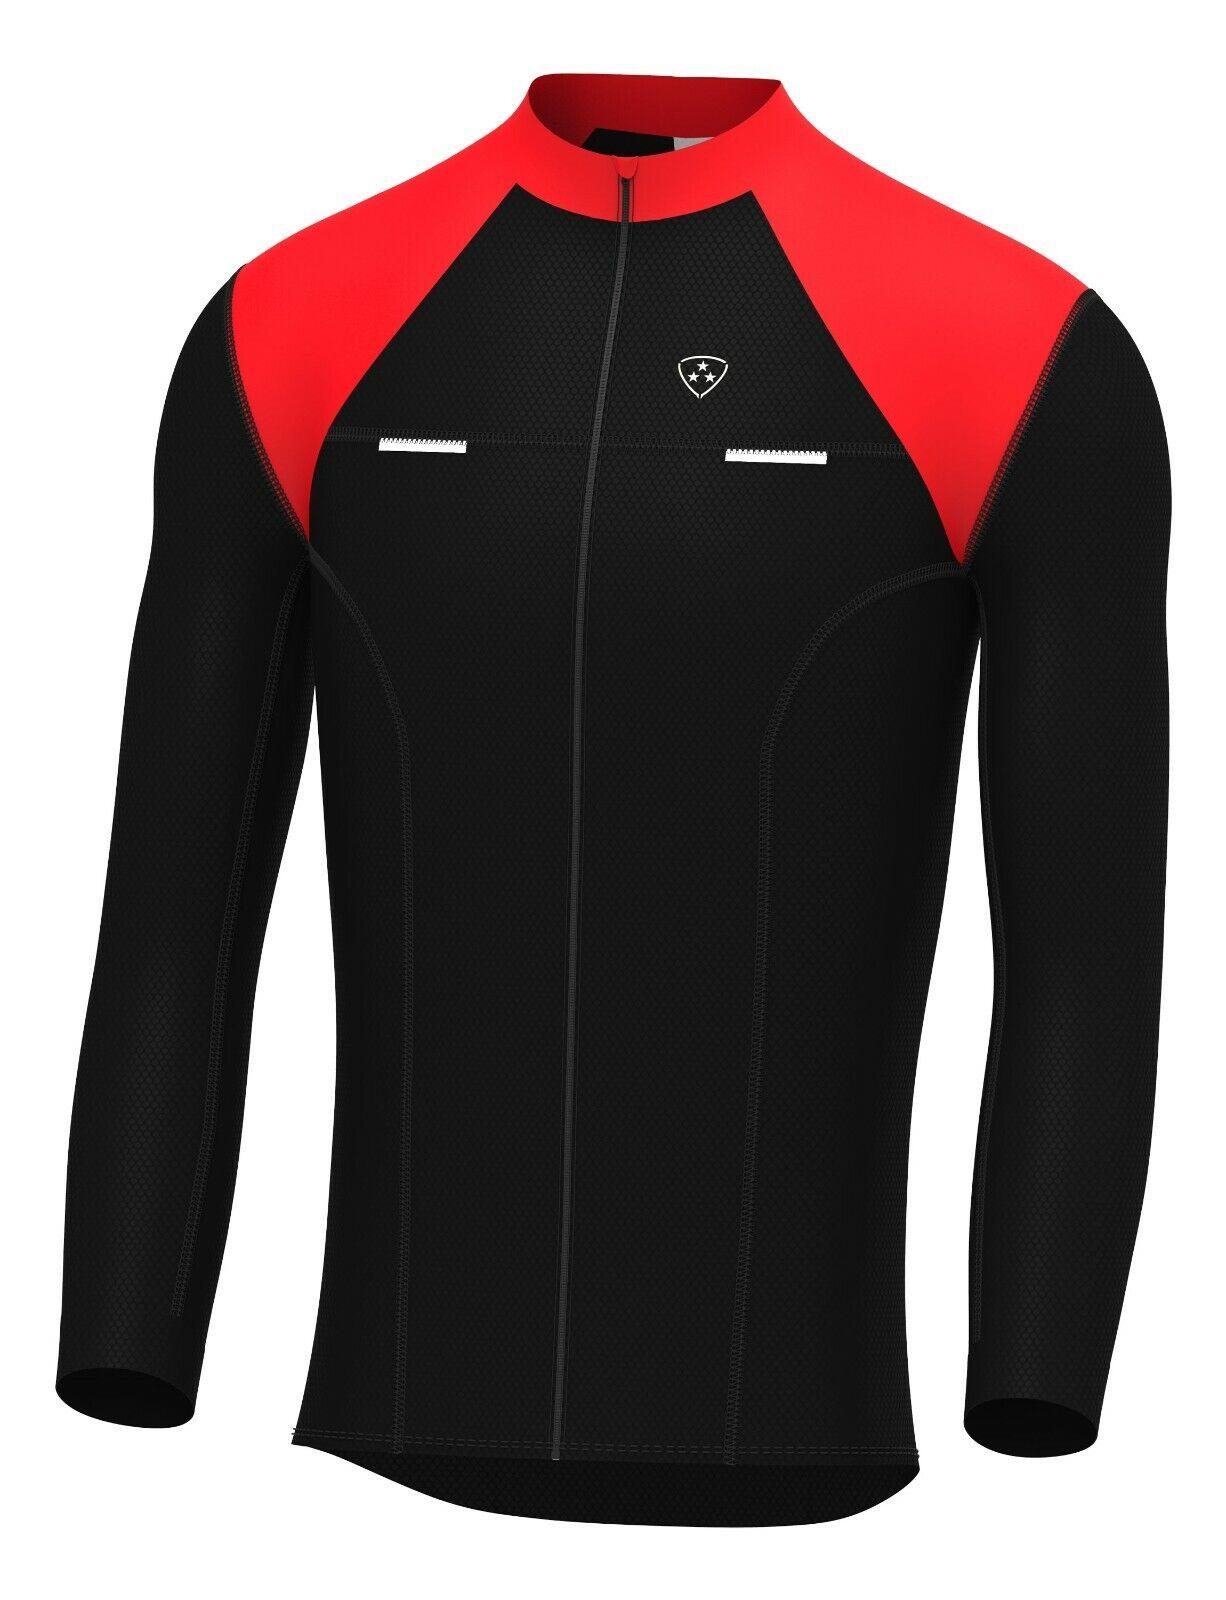 DHERA Mens Thermodream Cycling Jersey Full Sleeve Thermal Roubaix Cycling  Jacket | eBay